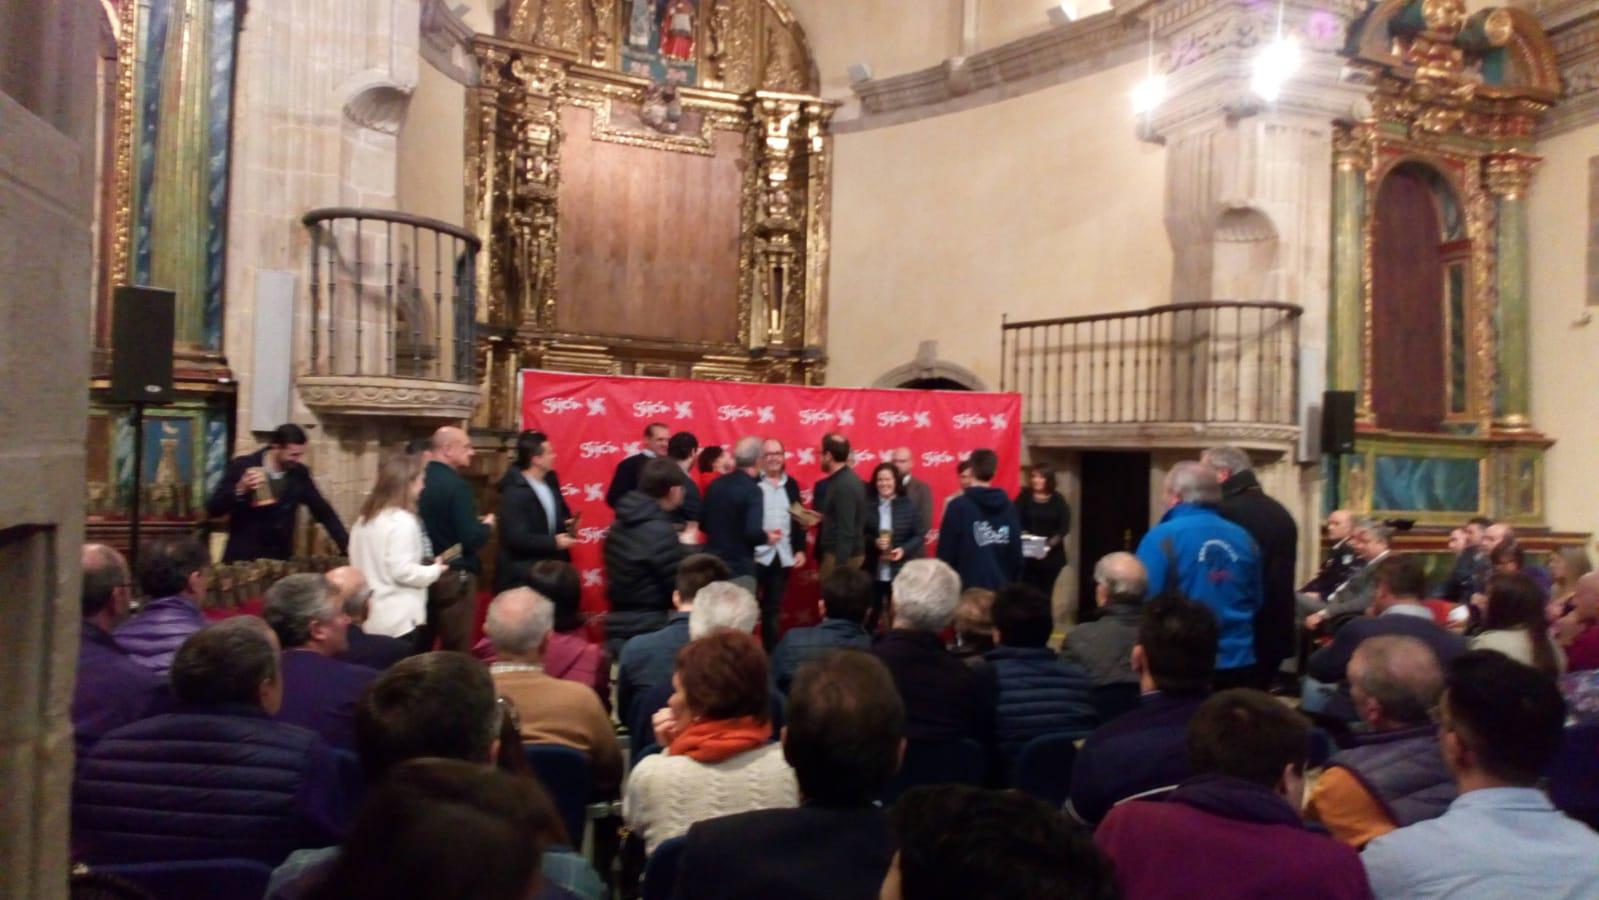 Reconocimiento al Deporte Gijonés Patronato Deportivo Municipal de Gijón PDM - 30 Días en Bici